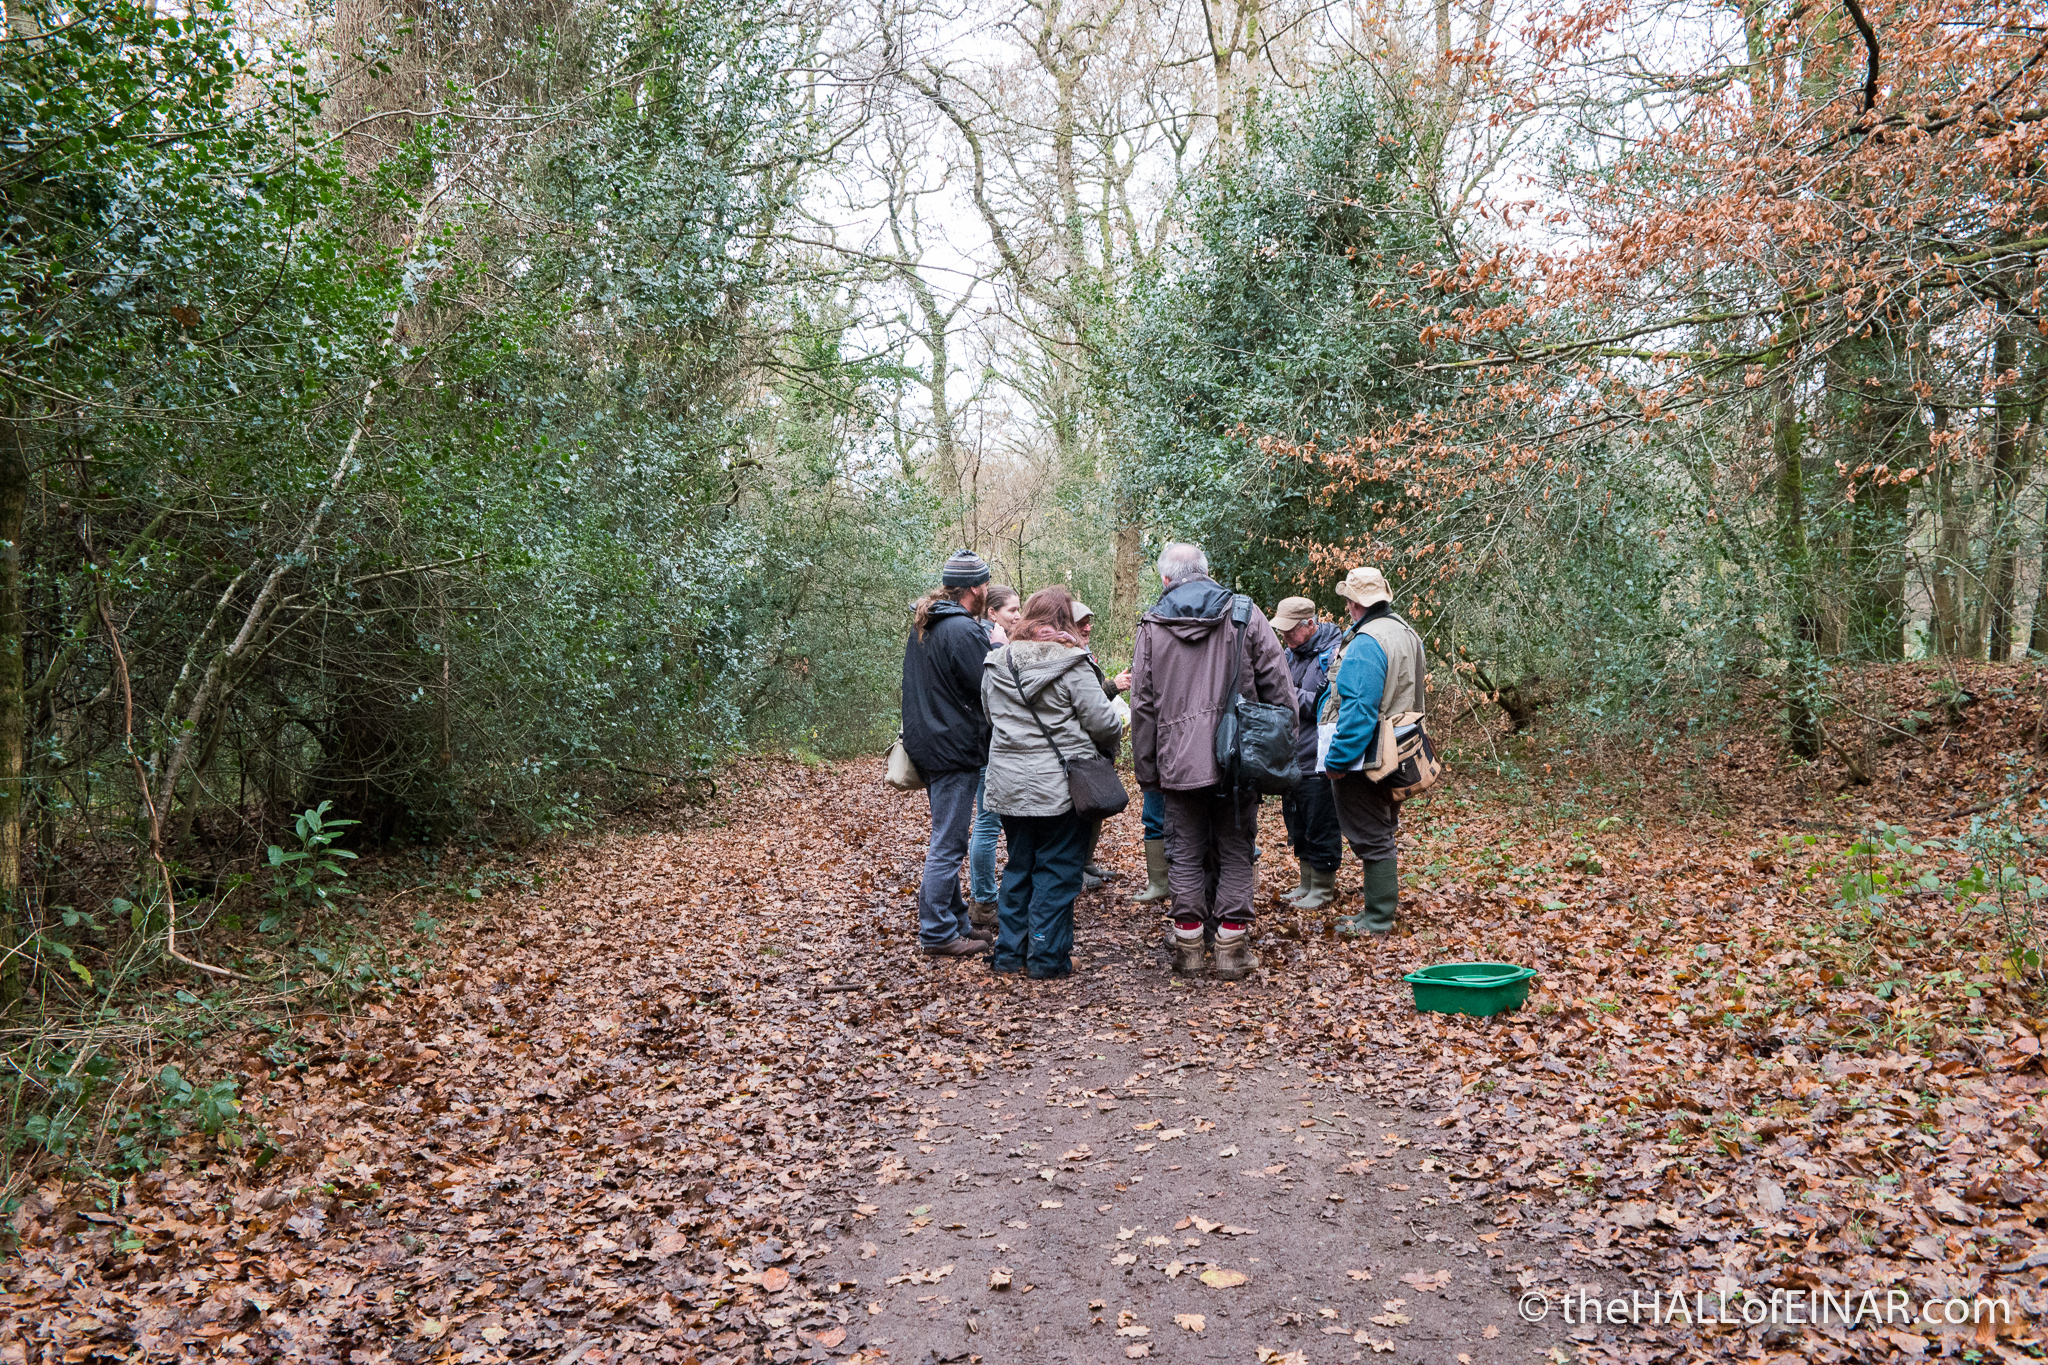 Devon Fungus Group - The Hall of Einar - photograph (c) David Bailey (not the)